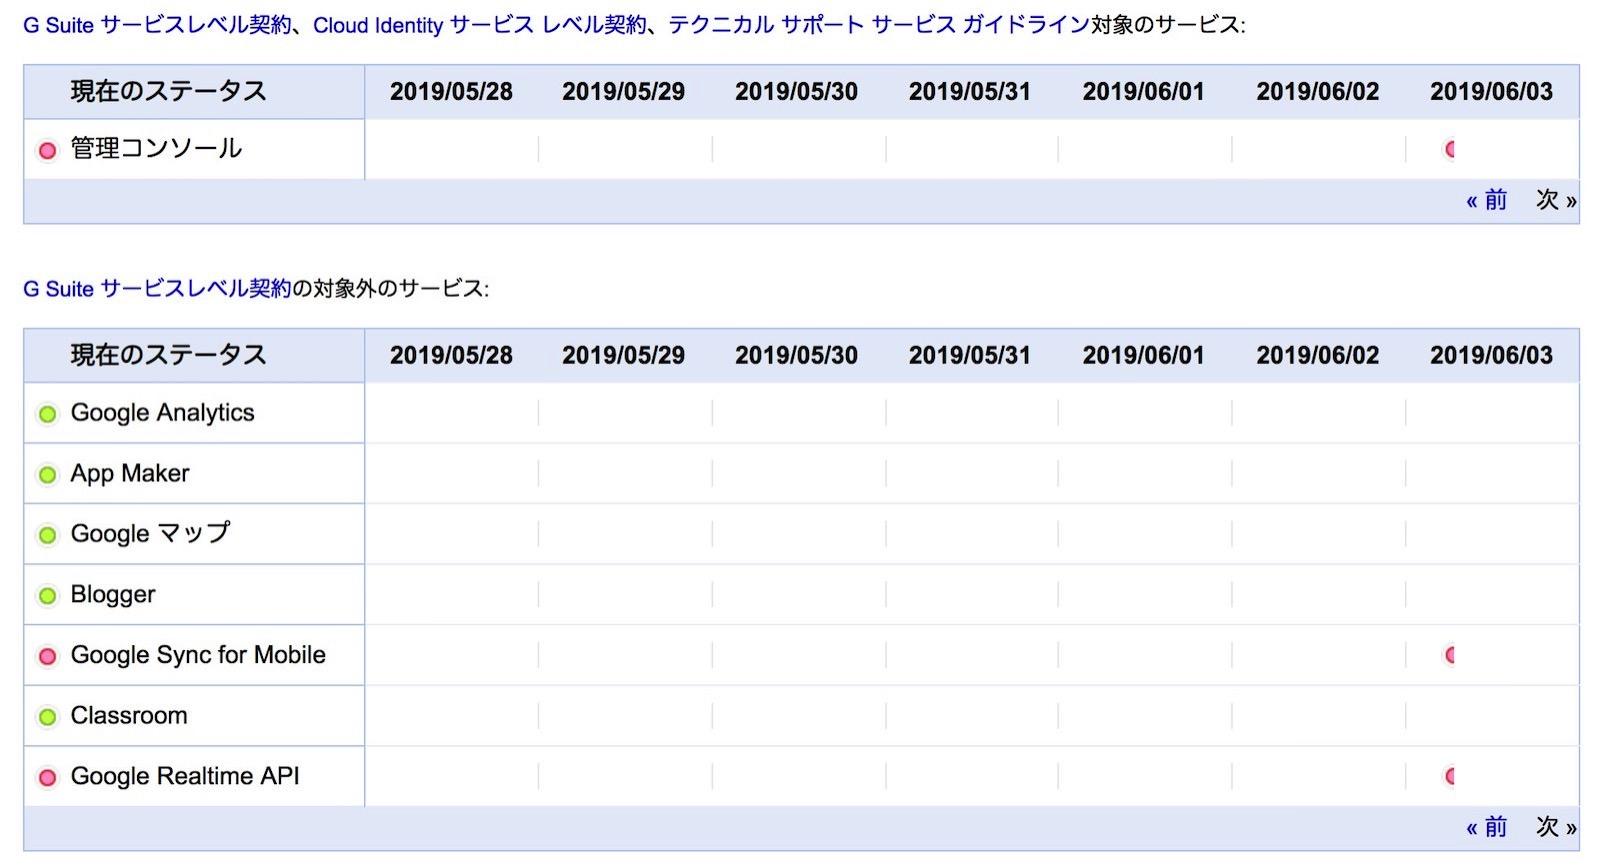 Google-Suite-Status-201906030655-2.jpg